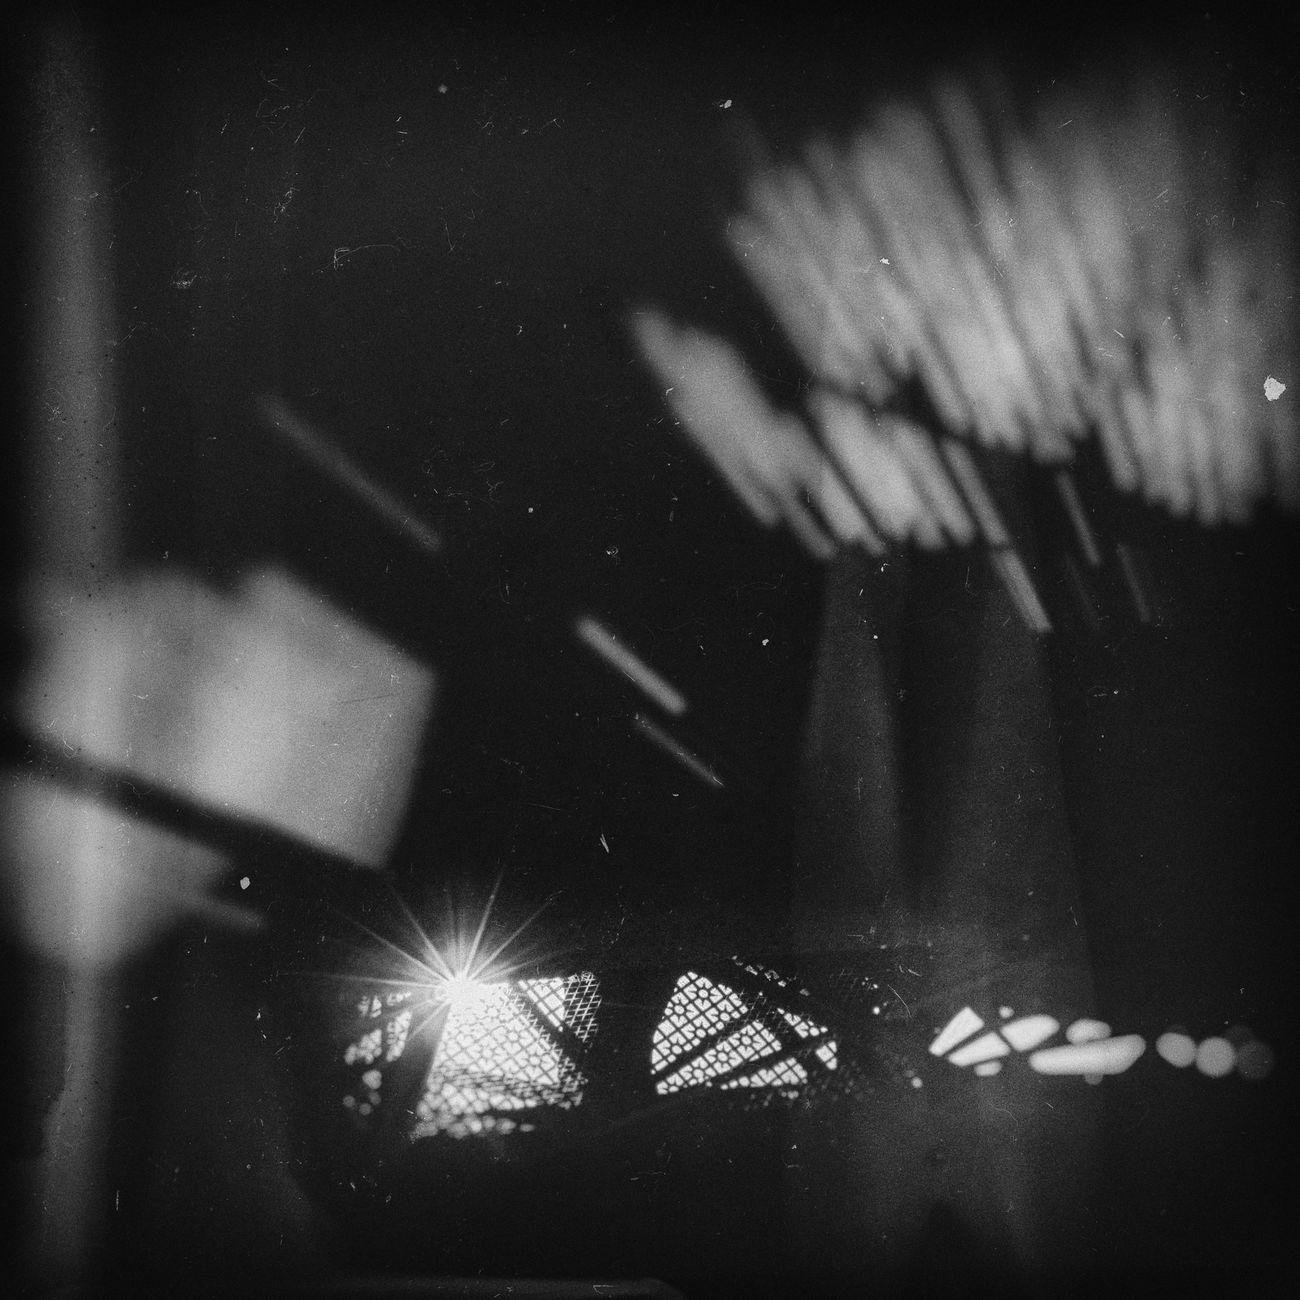 Abstract Dark Darkness And Light Day Focus On Shadow Grunge Illuminated Mopnochrome No People Sun Sunbeam Sunlight